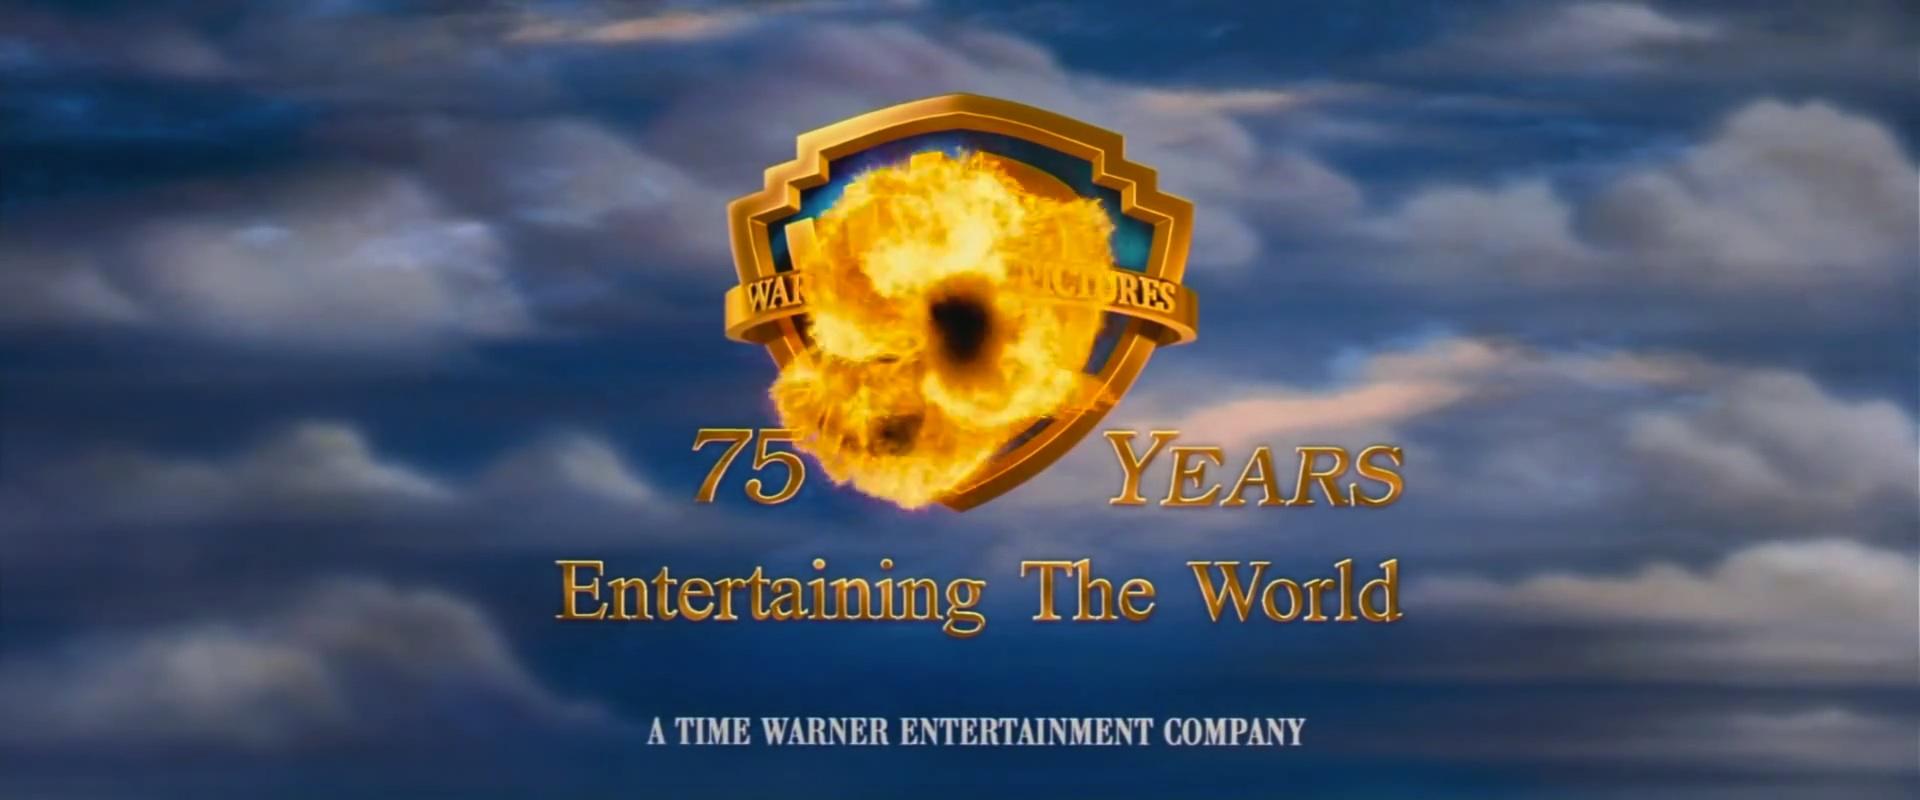 Warner Bros. - Lethal Weapon 4